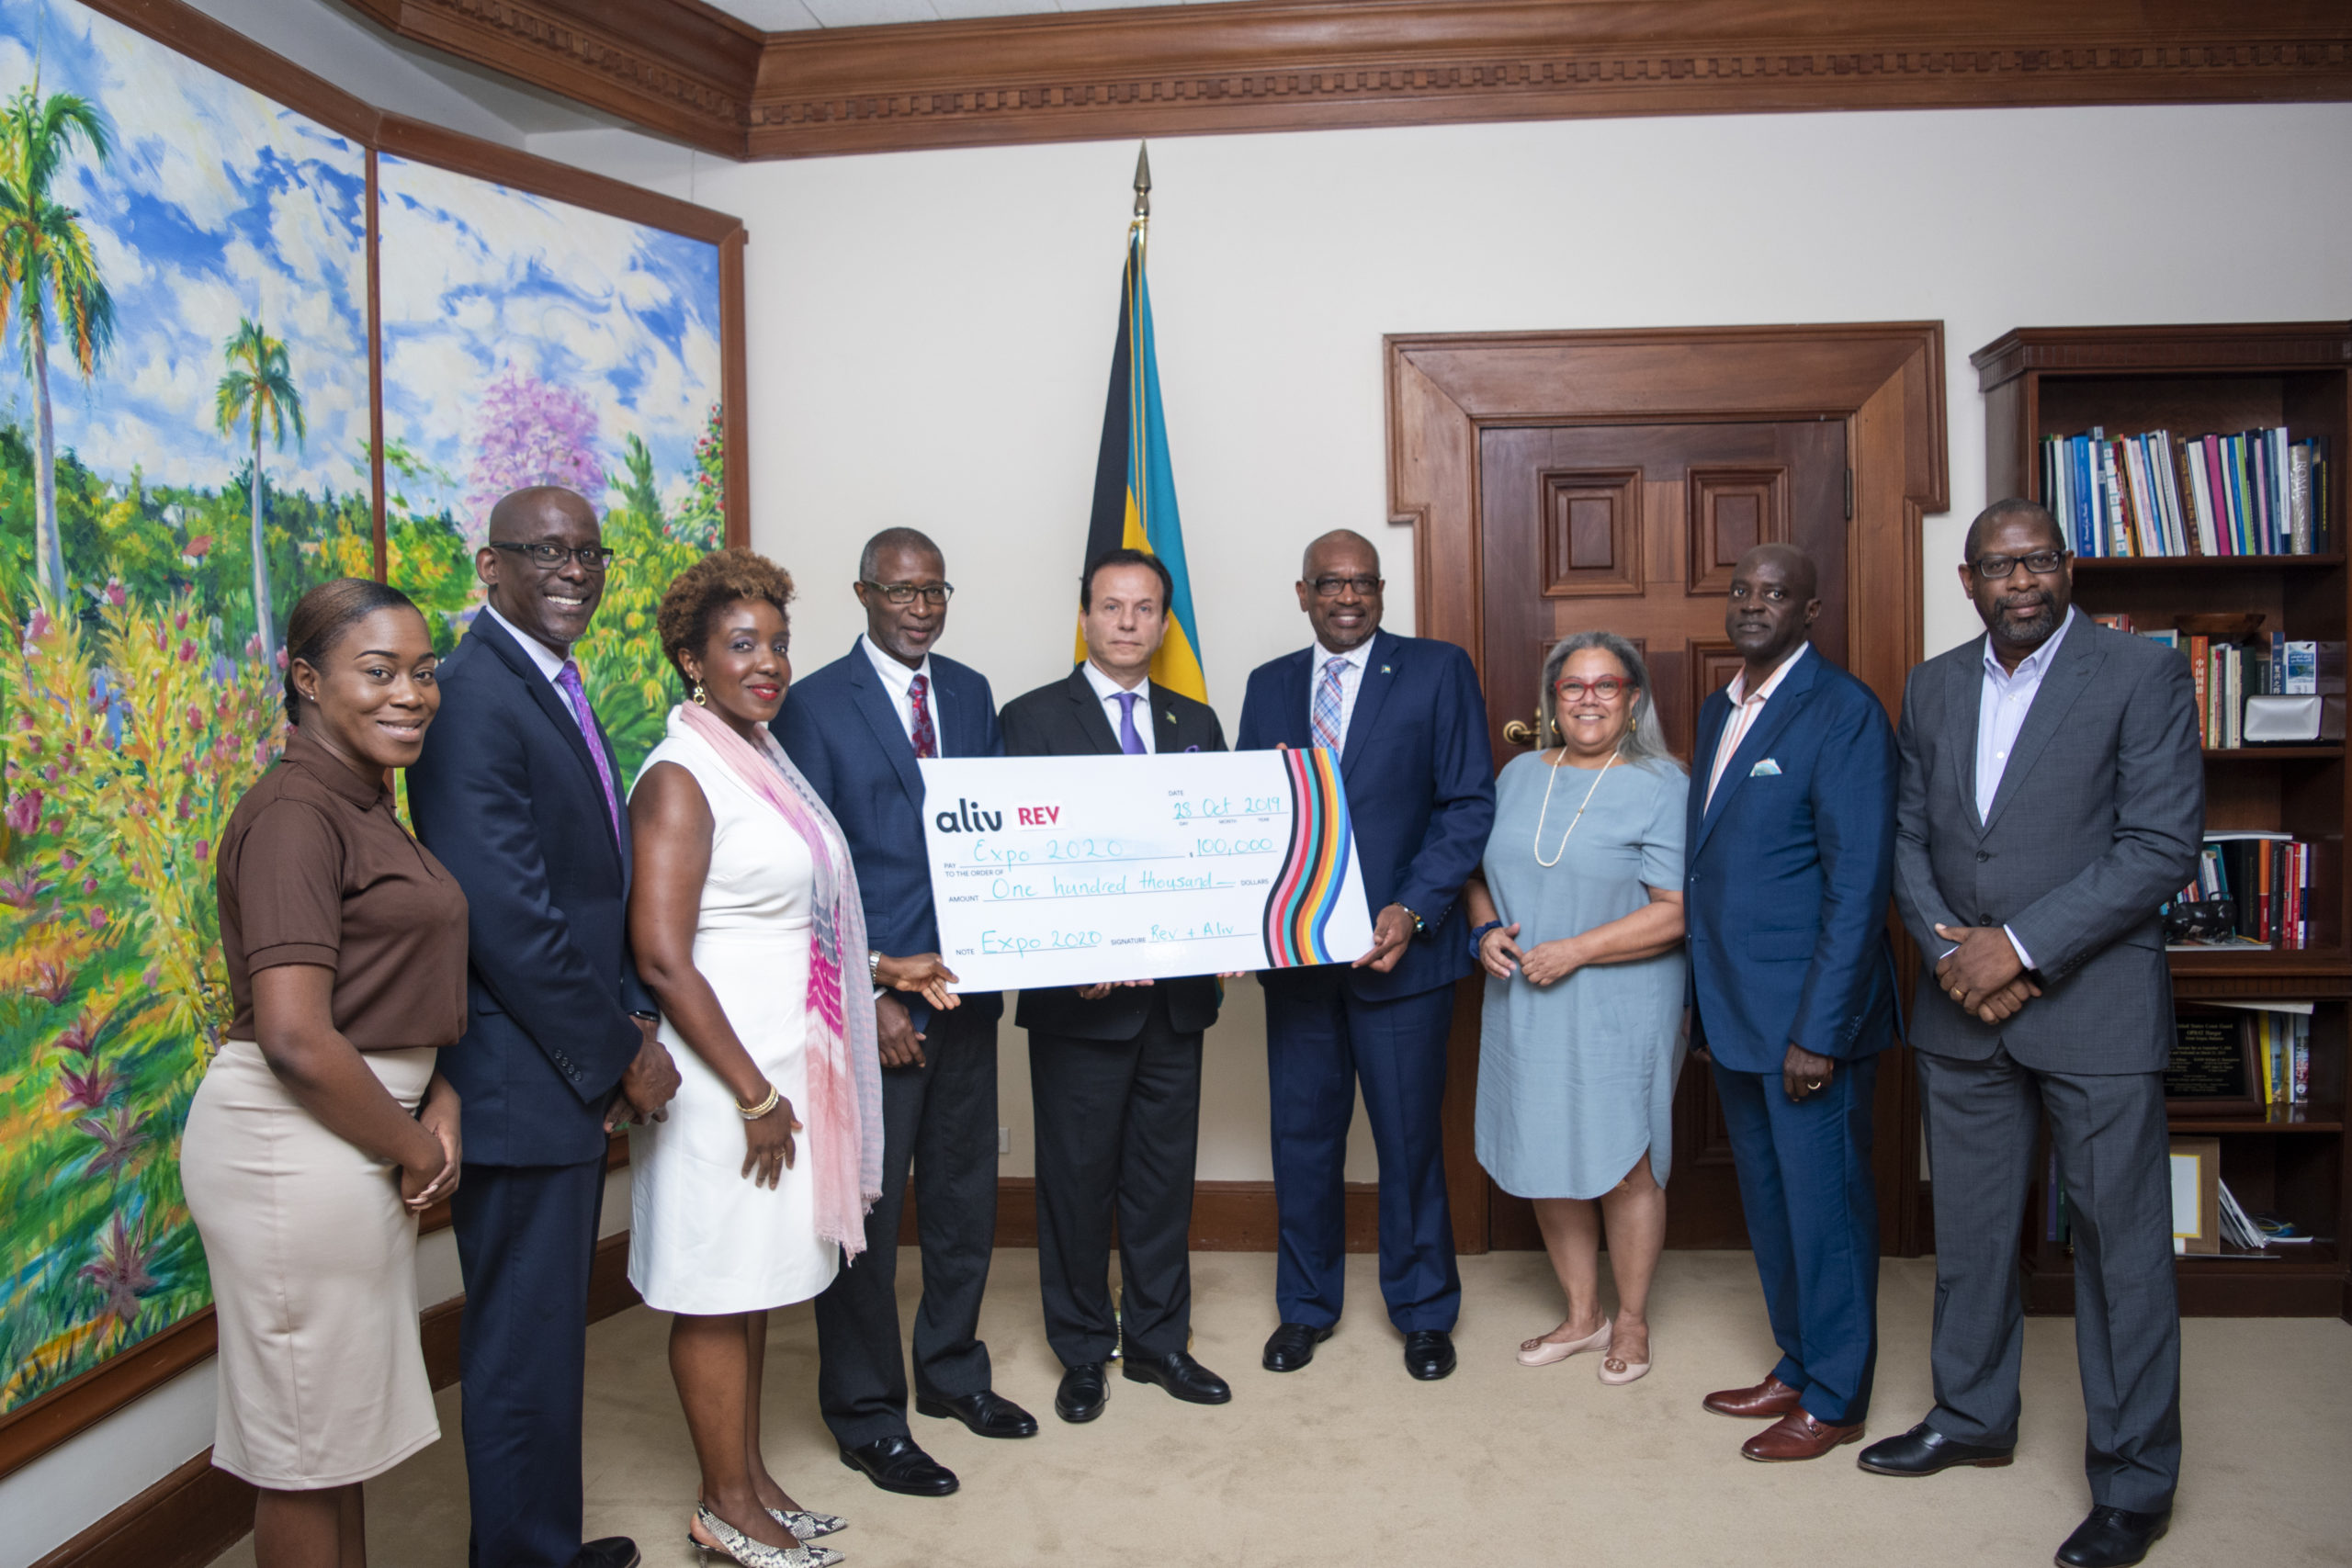 Prime Minister Minnis accepts donation for Expo 2020 Dubai Bahamas Pavilion